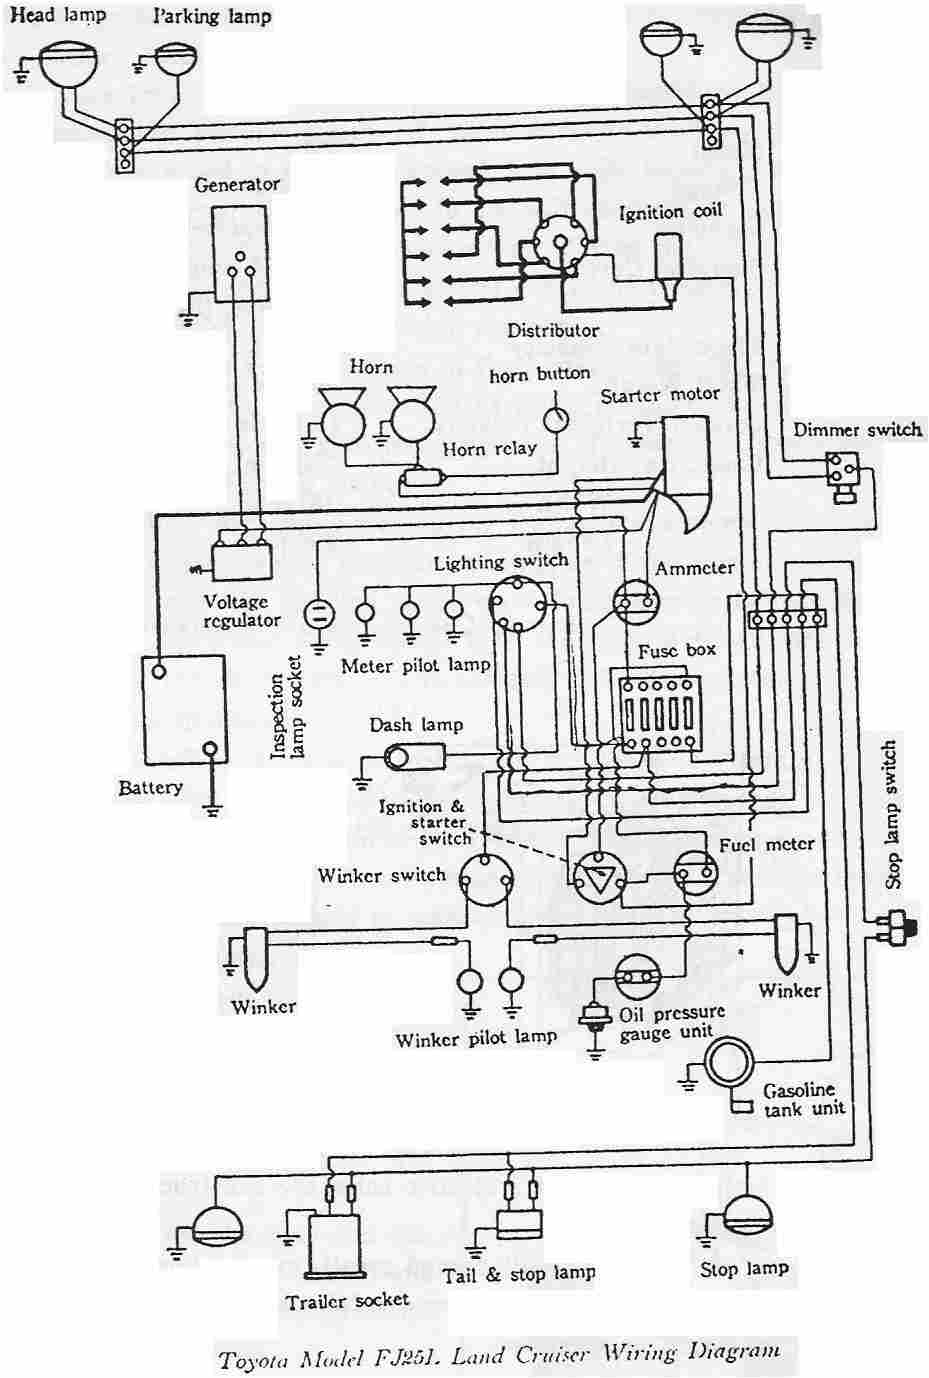 86120 yy210 wiring diagram toyota basic guide wiring diagram \u2022 toyota  radio toyota 86120 0c020